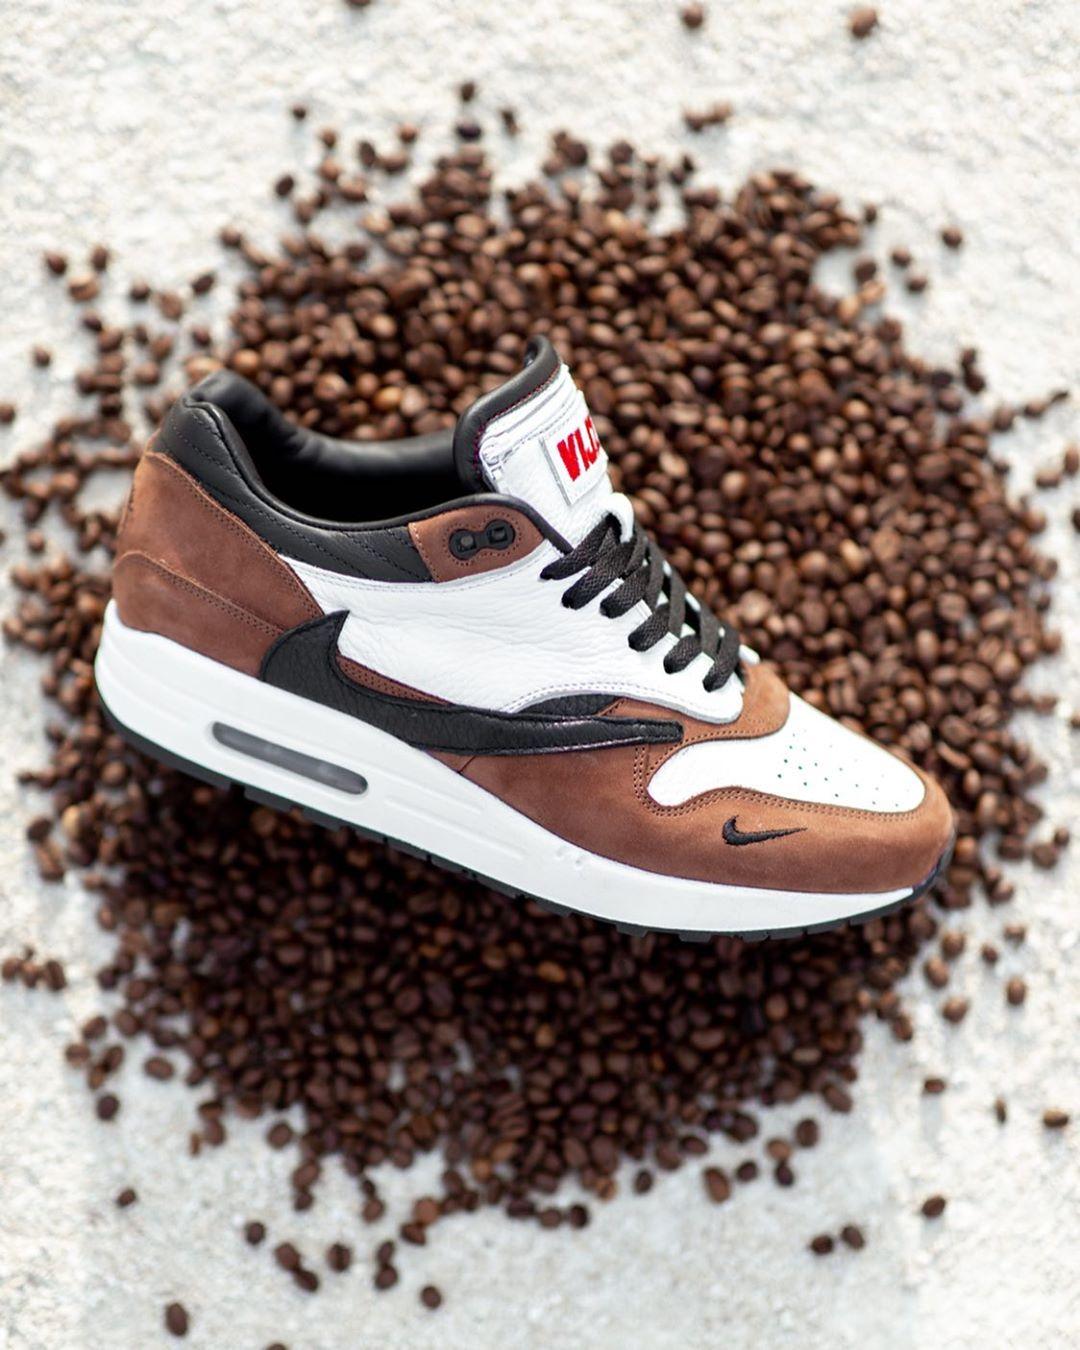 Nike,Air Max 1,Travis Scott,VI  不一样的「反钩 Air Max 1」来了!鞋舌口袋别具匠心!